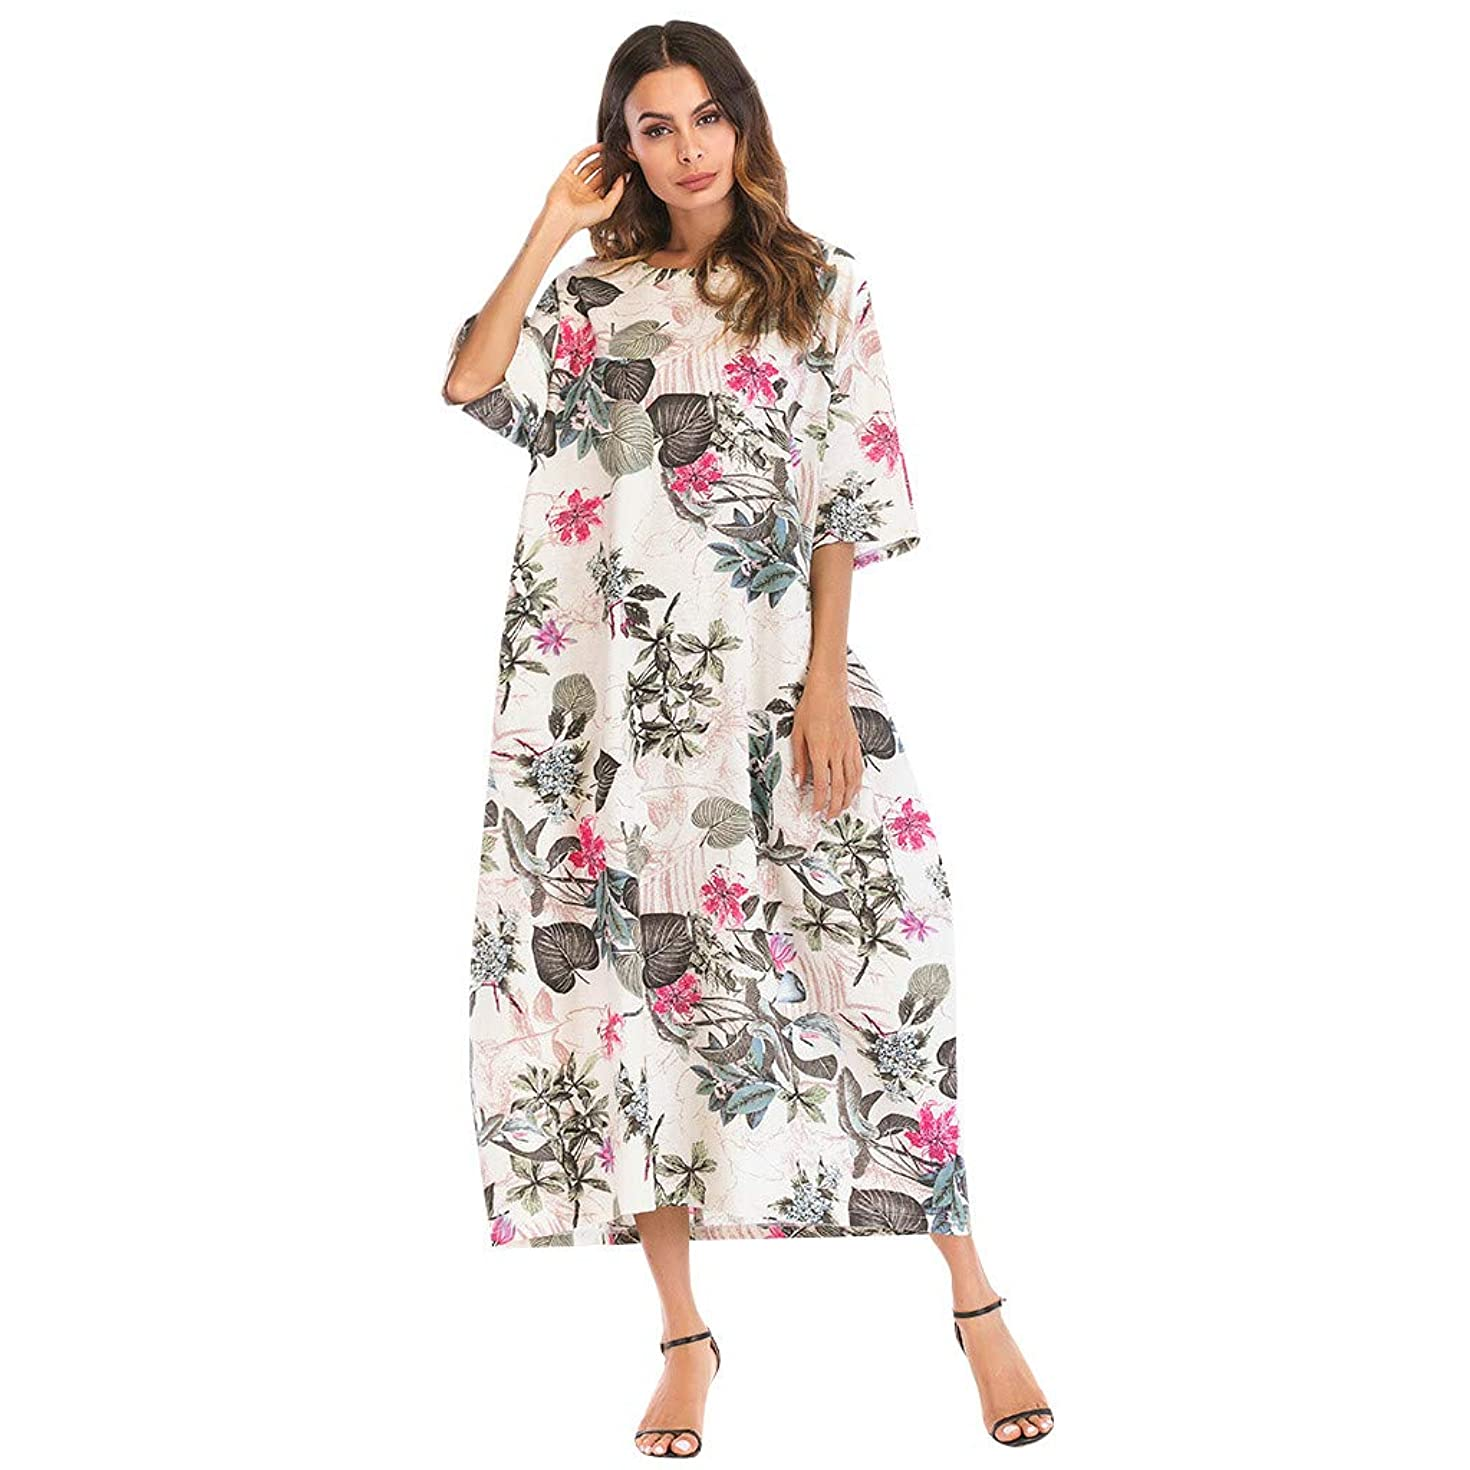 Women Boho Cotton Linen Dress Printed O-Neck Half Sleeve Loose Long Plus Size Dress